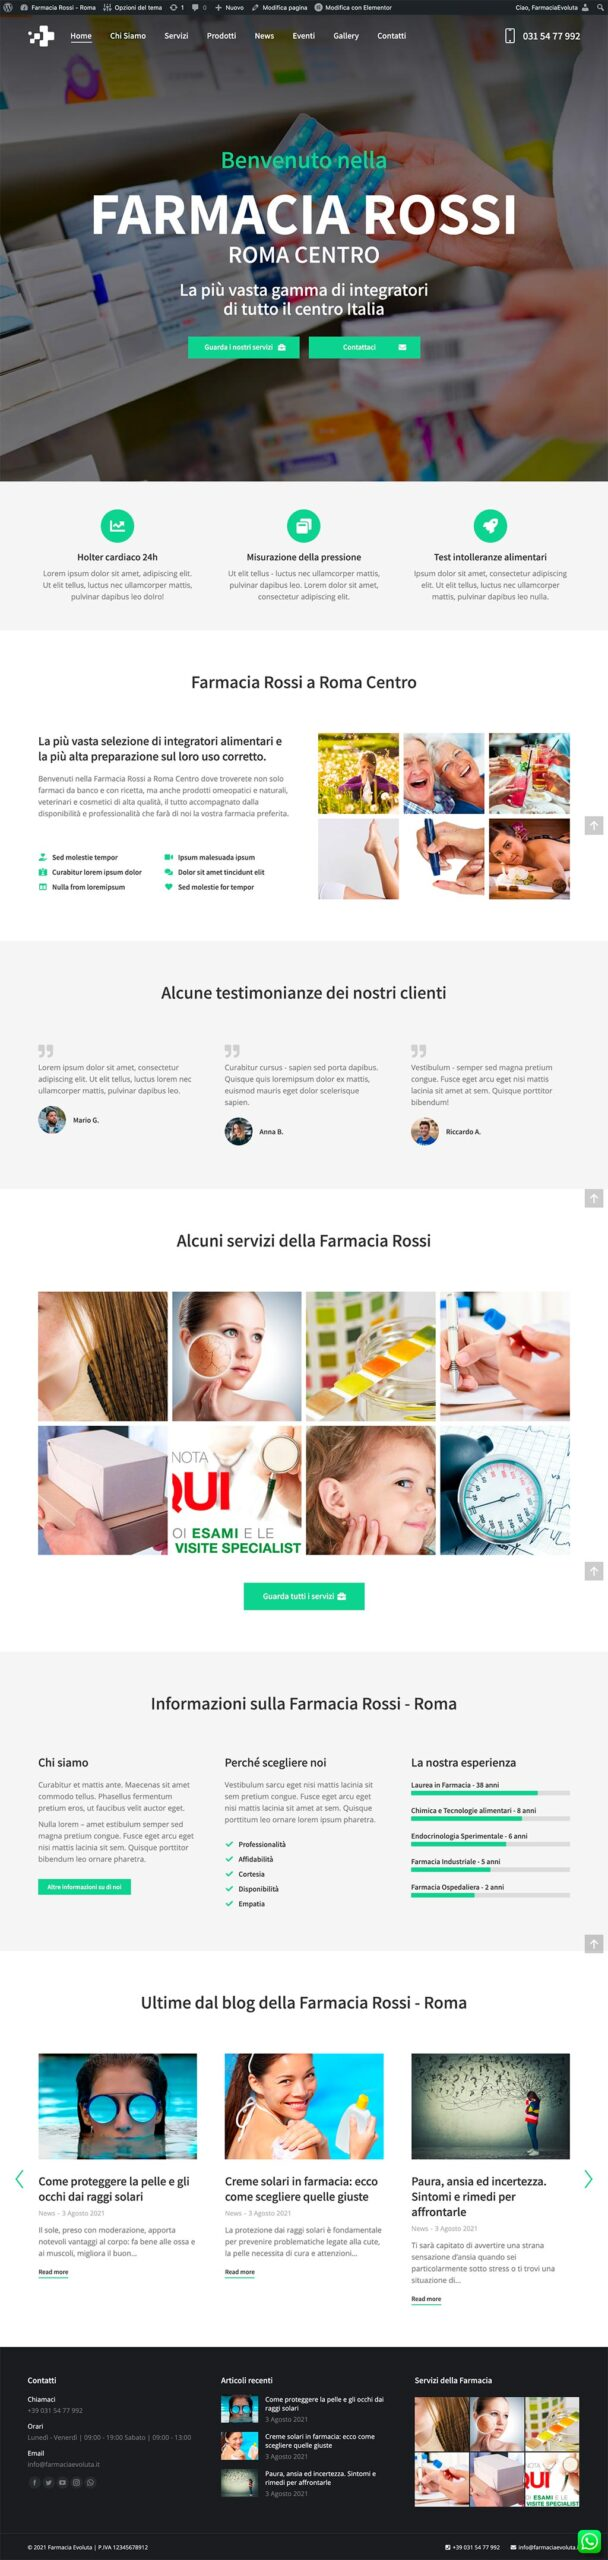 farmacia evoluta next generation - quarzo